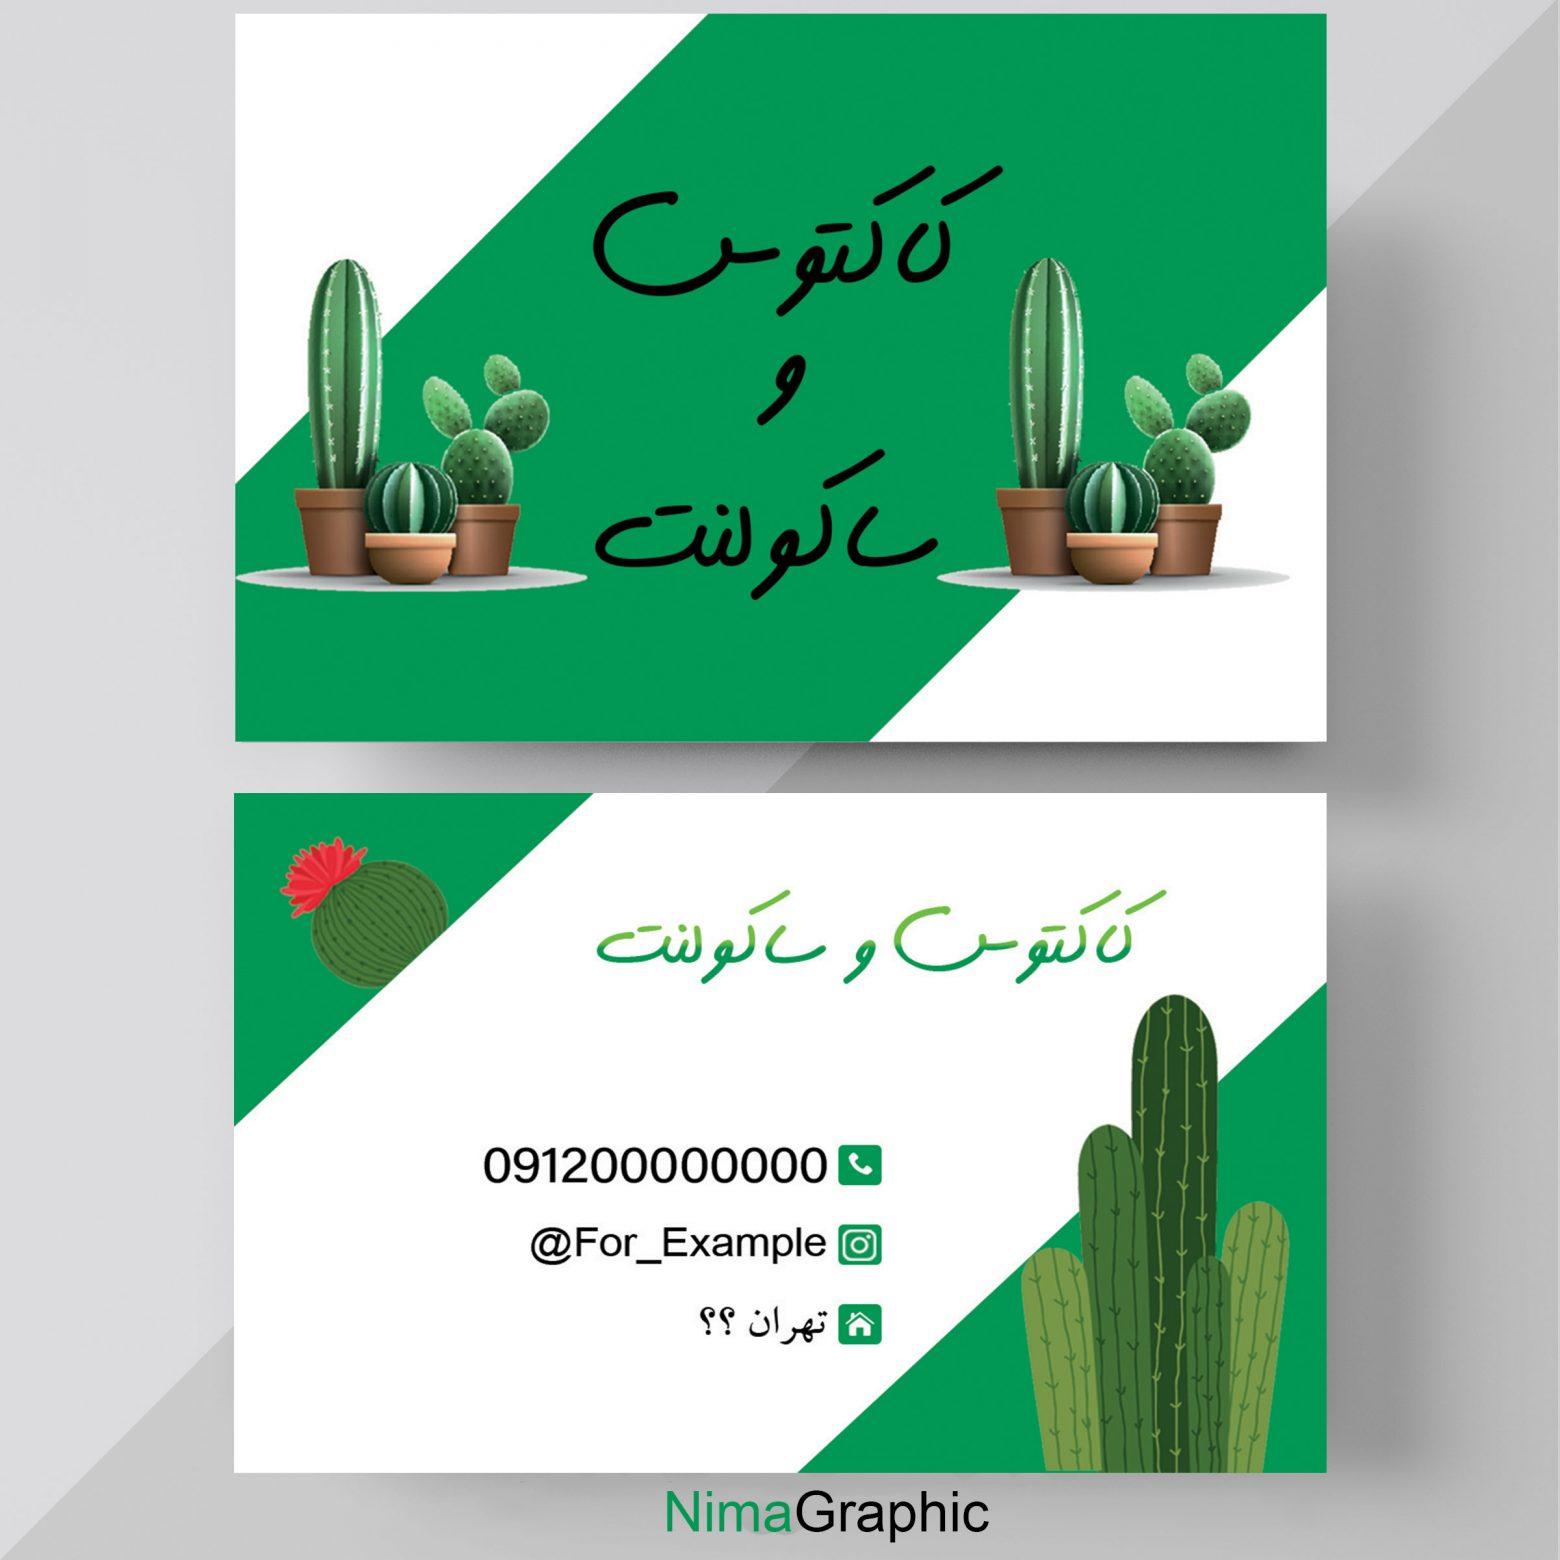 1104 1560x1560 - کارت ویزیت لایه باز کاکتوس و ساکولنت